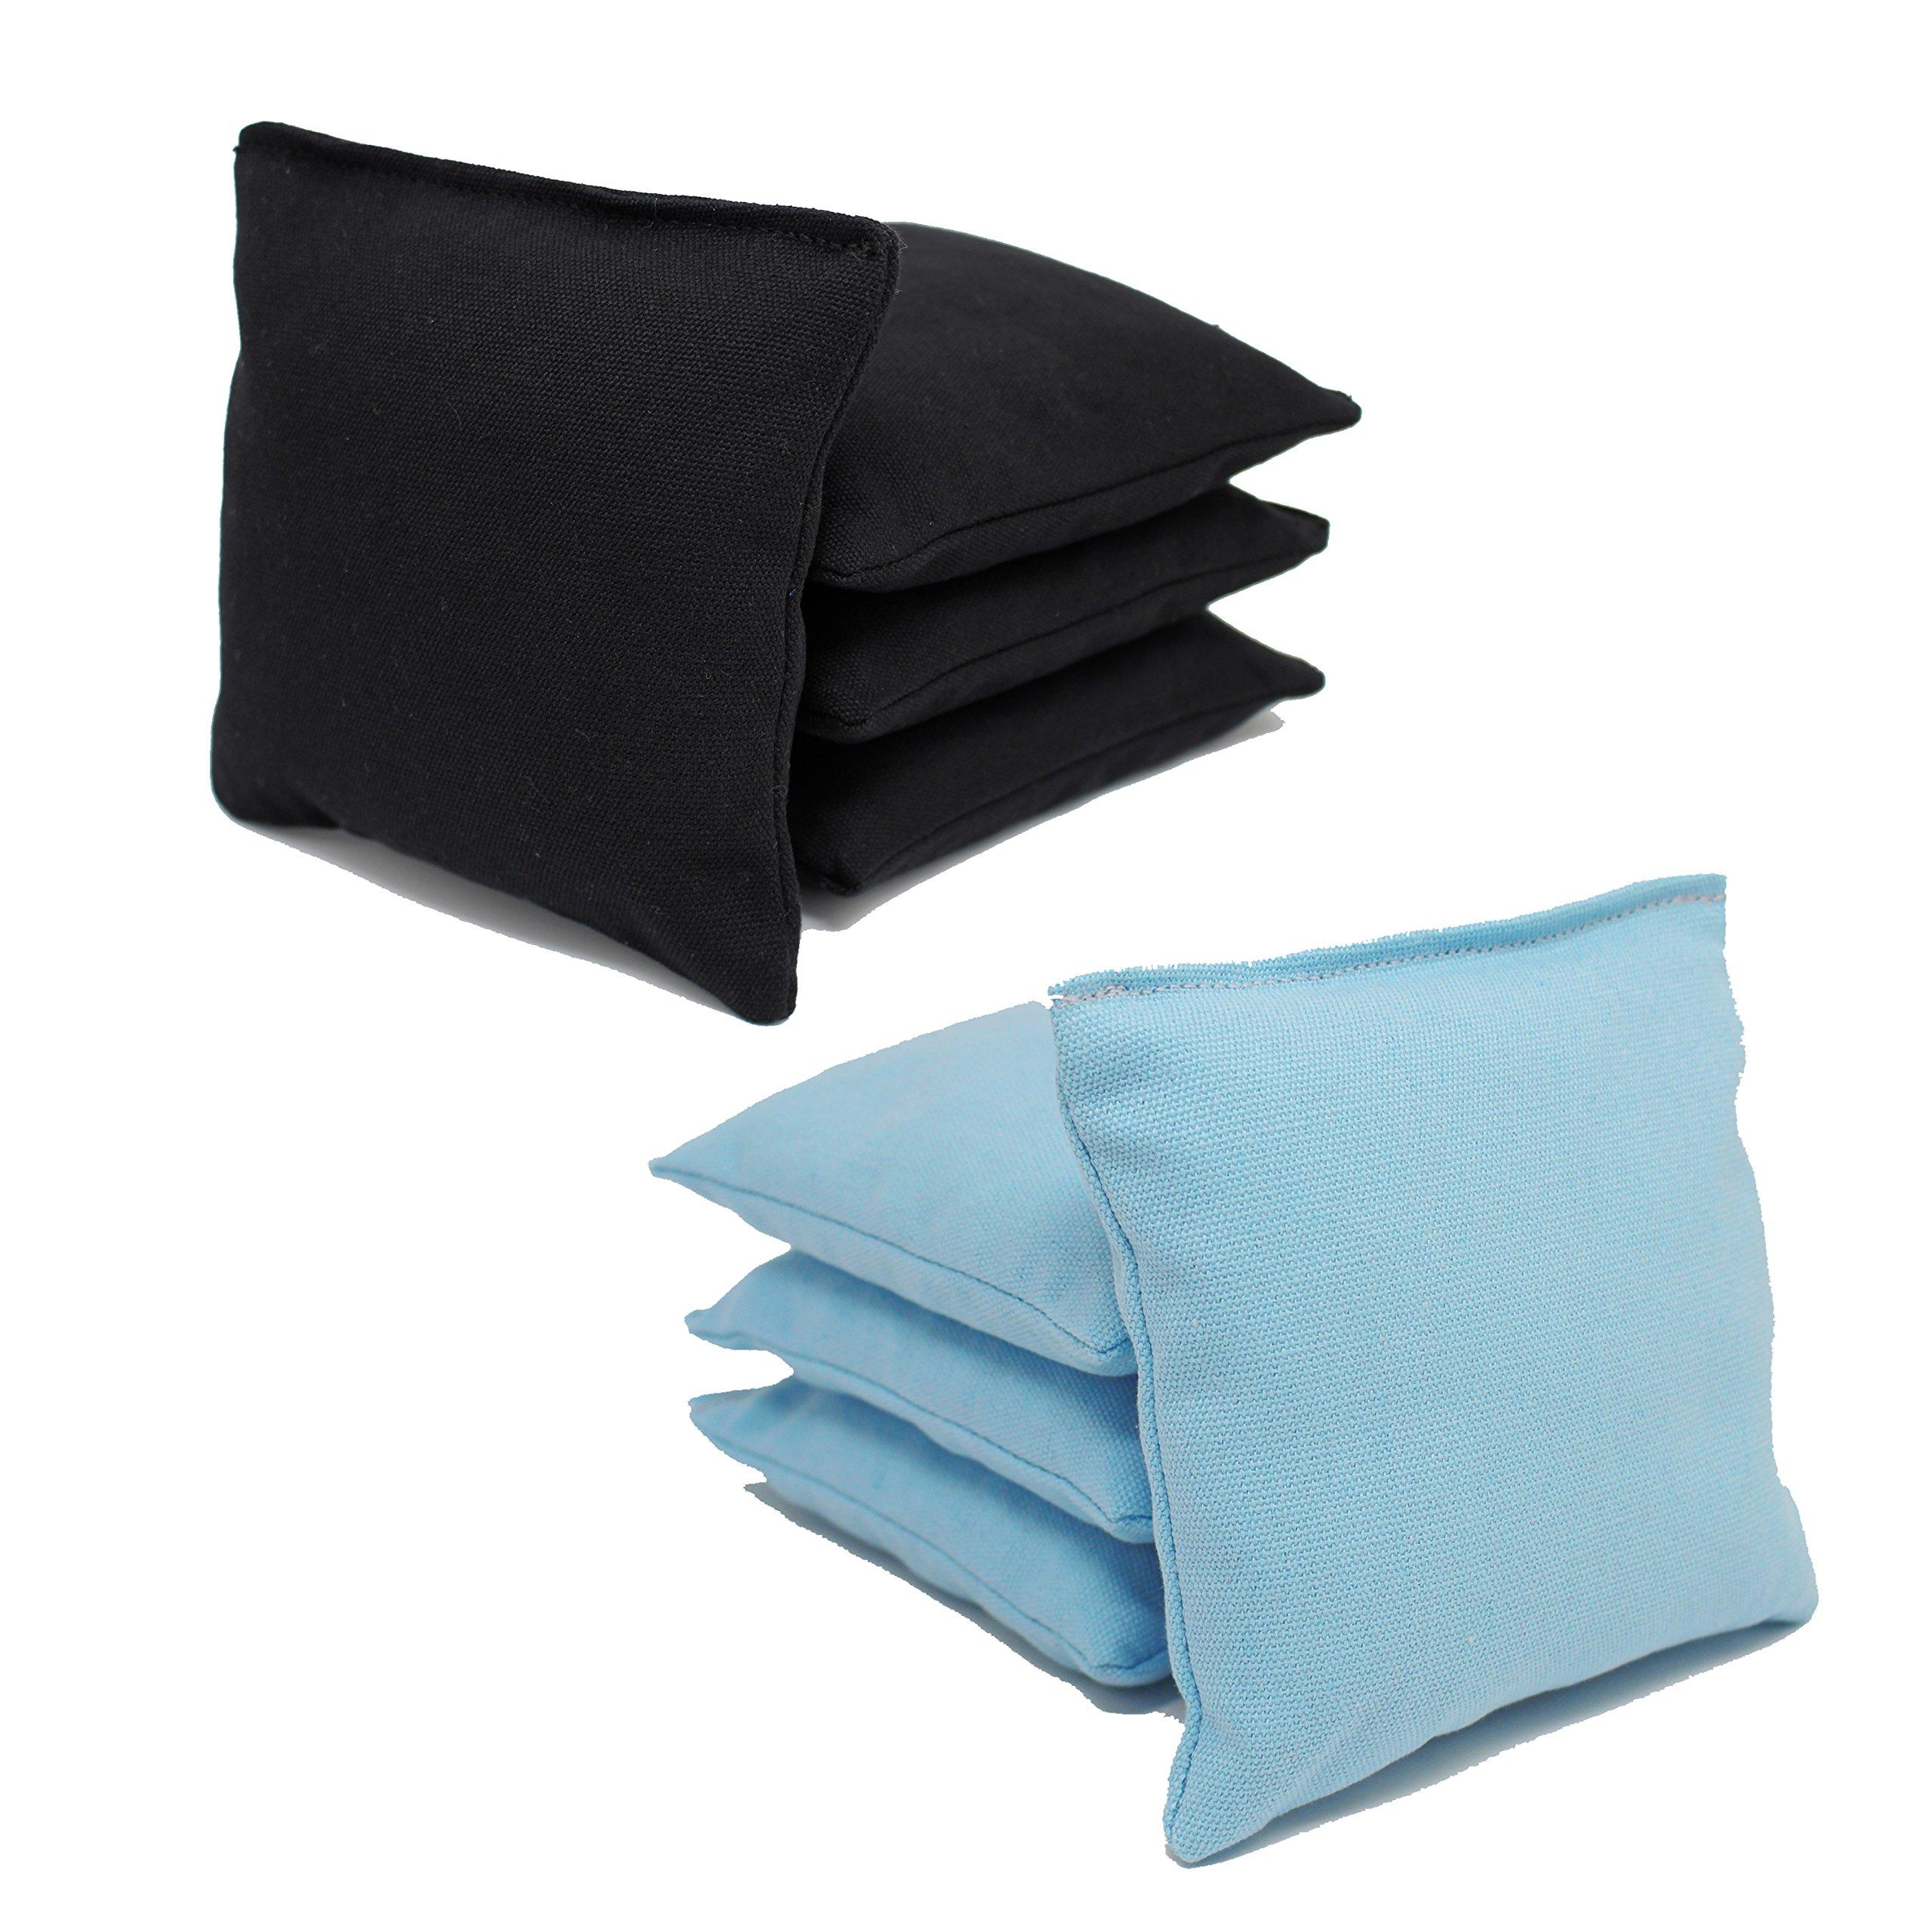 Cornhole Bags Set - (4 Light Blue, 4 Black) By Free Donkey Sports by Free Donkey Sports